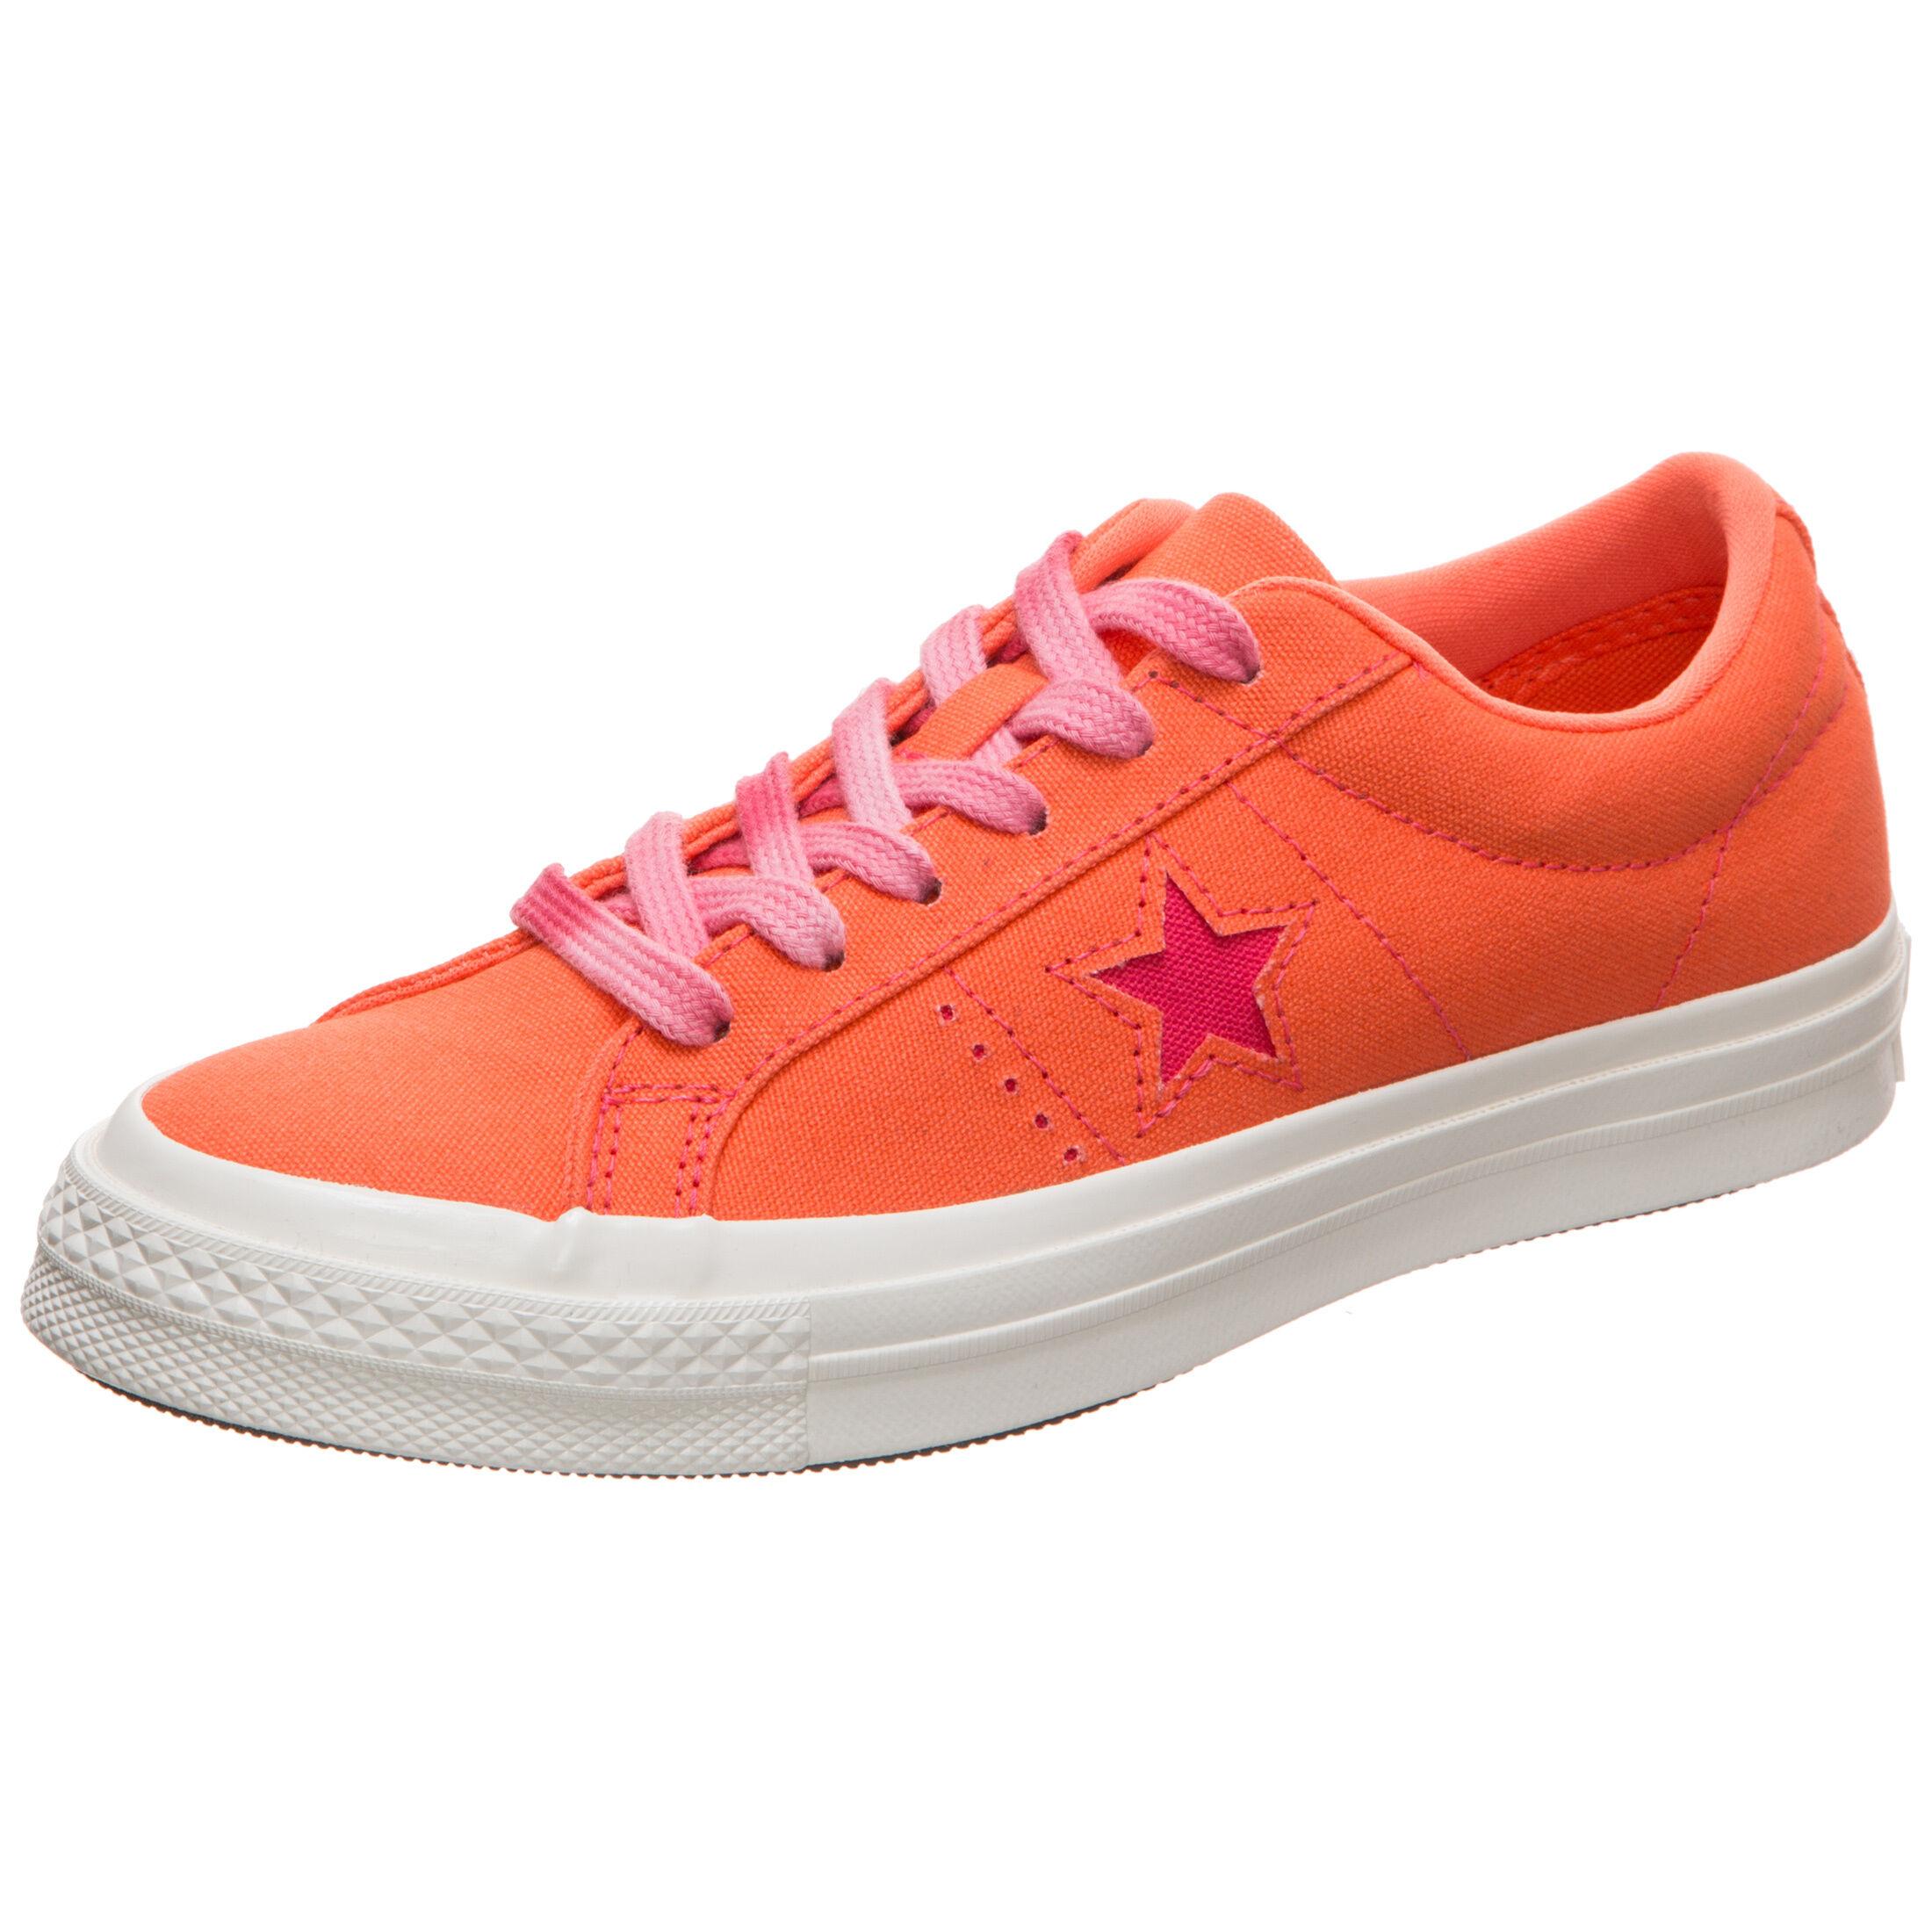 Sneaker Converse Orange | Schuhe Frauen bei OUTFITTER